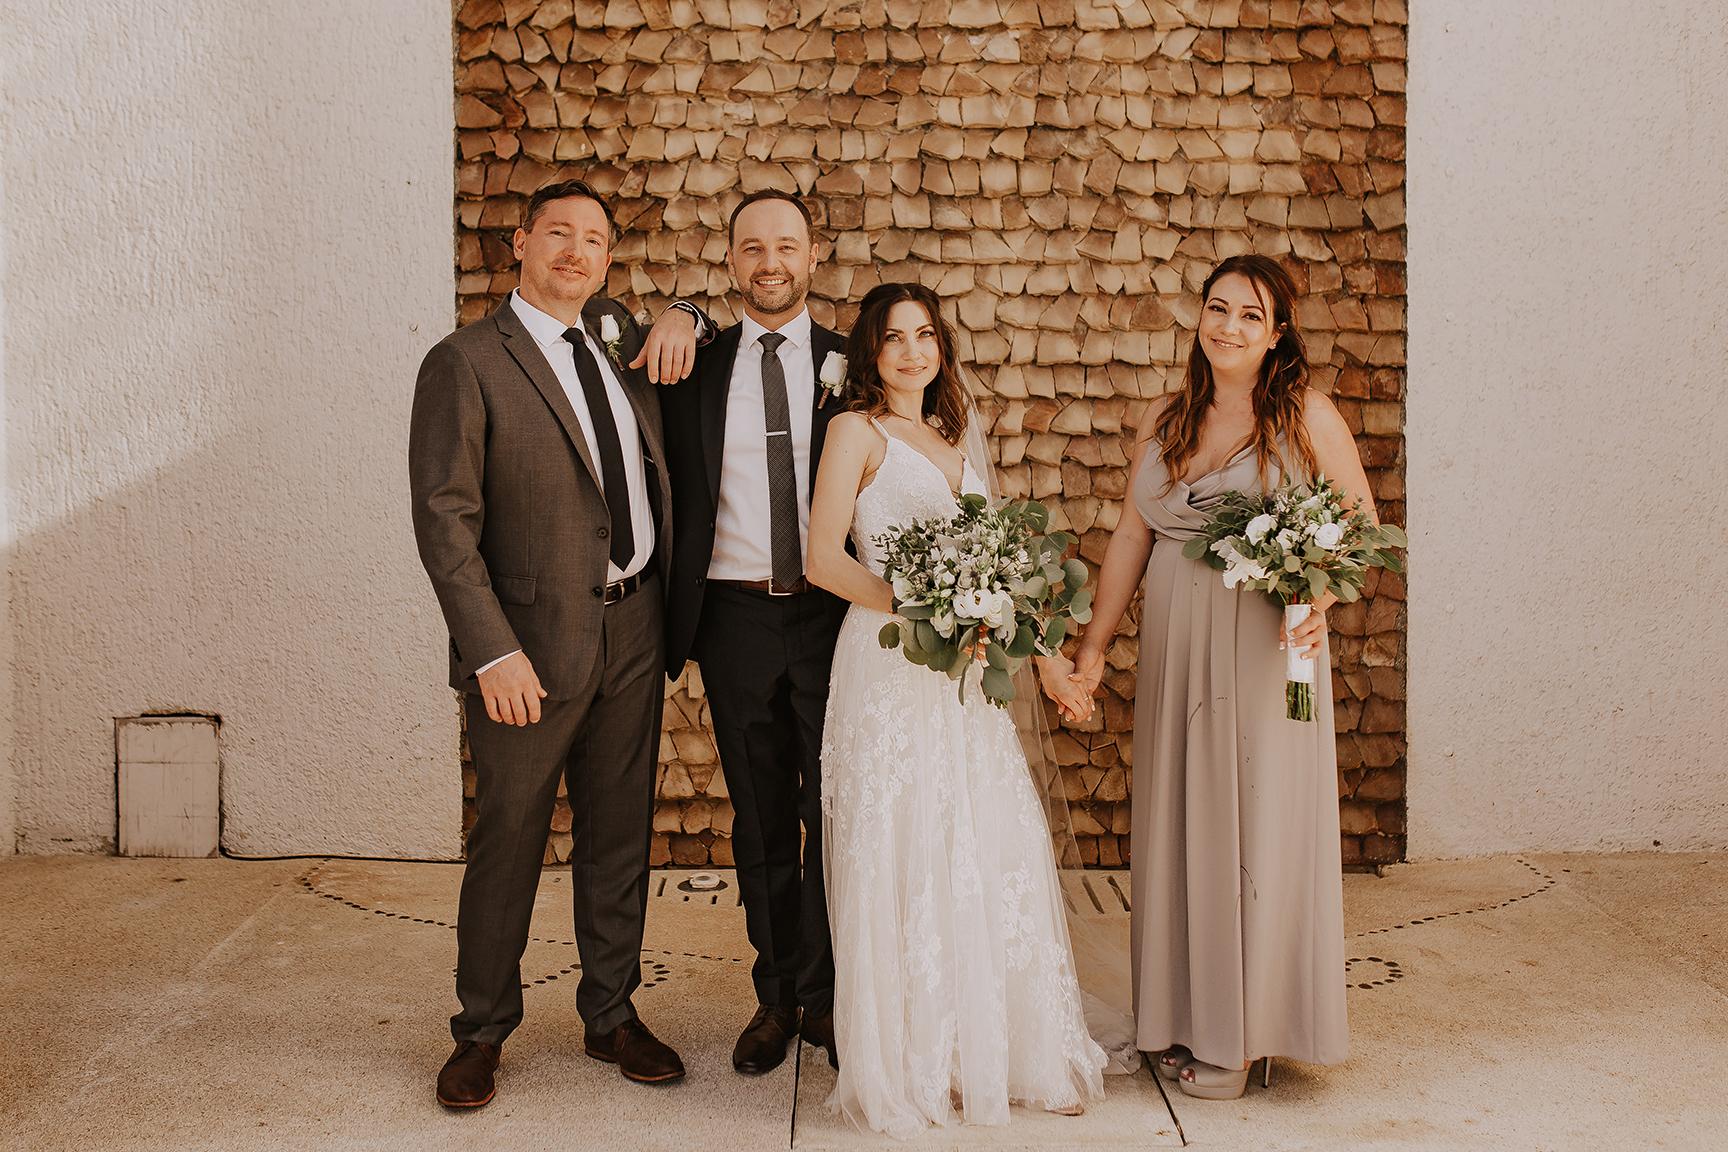 Lindsei+James_cabo_wedding_413.jpg